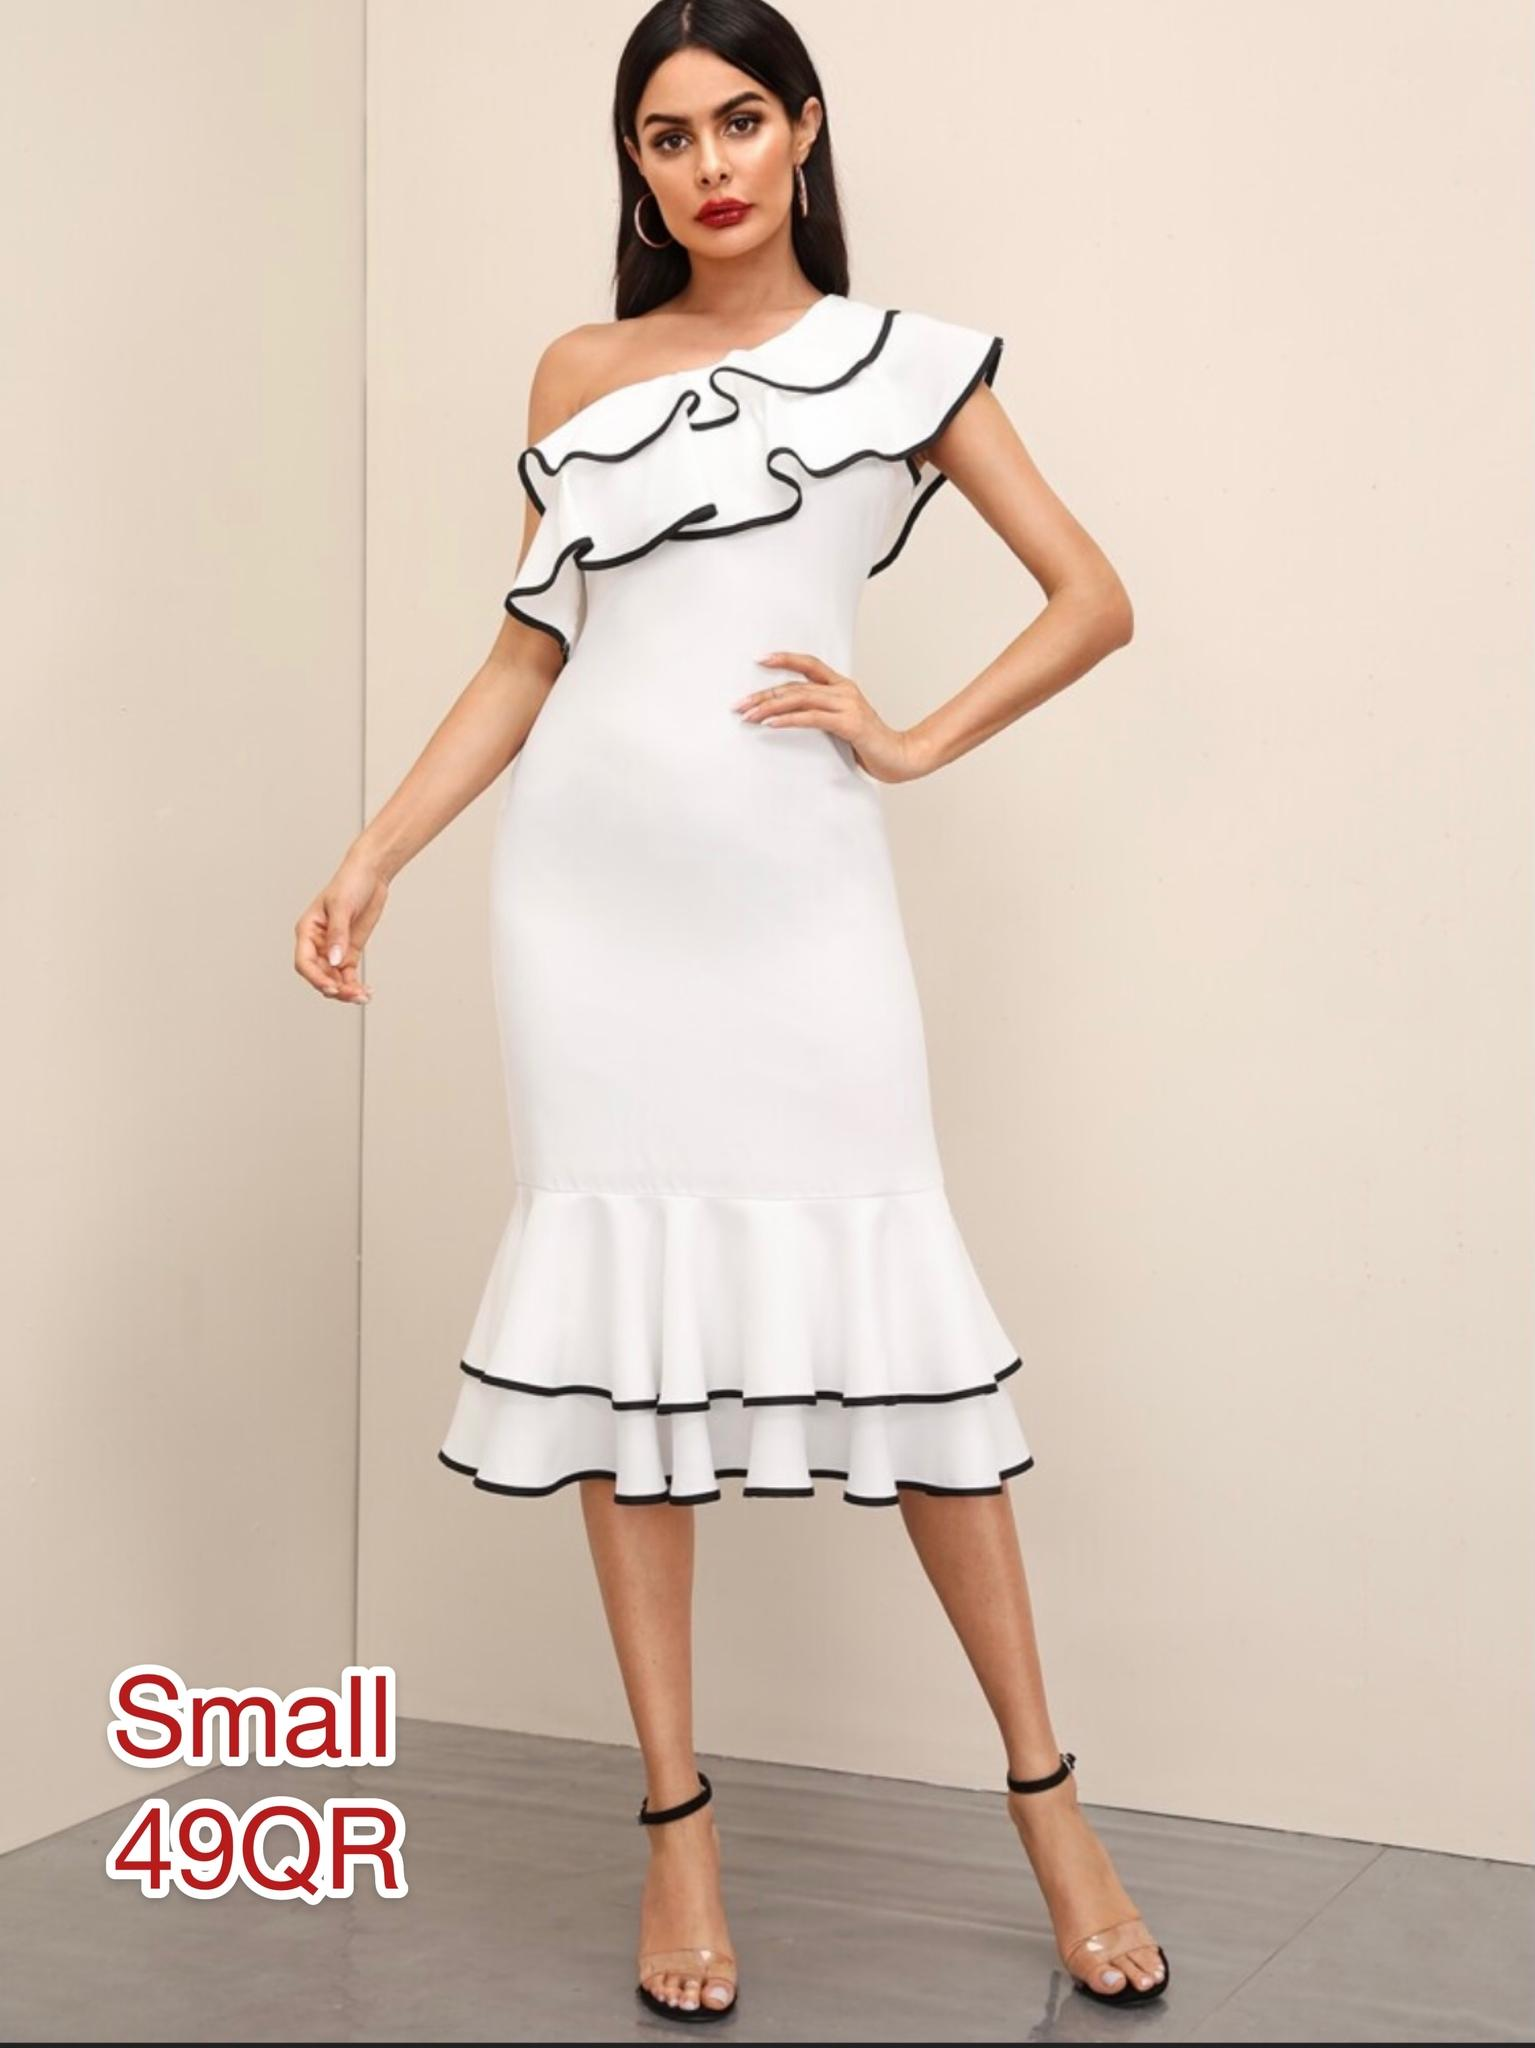 Glamorous Party Dress